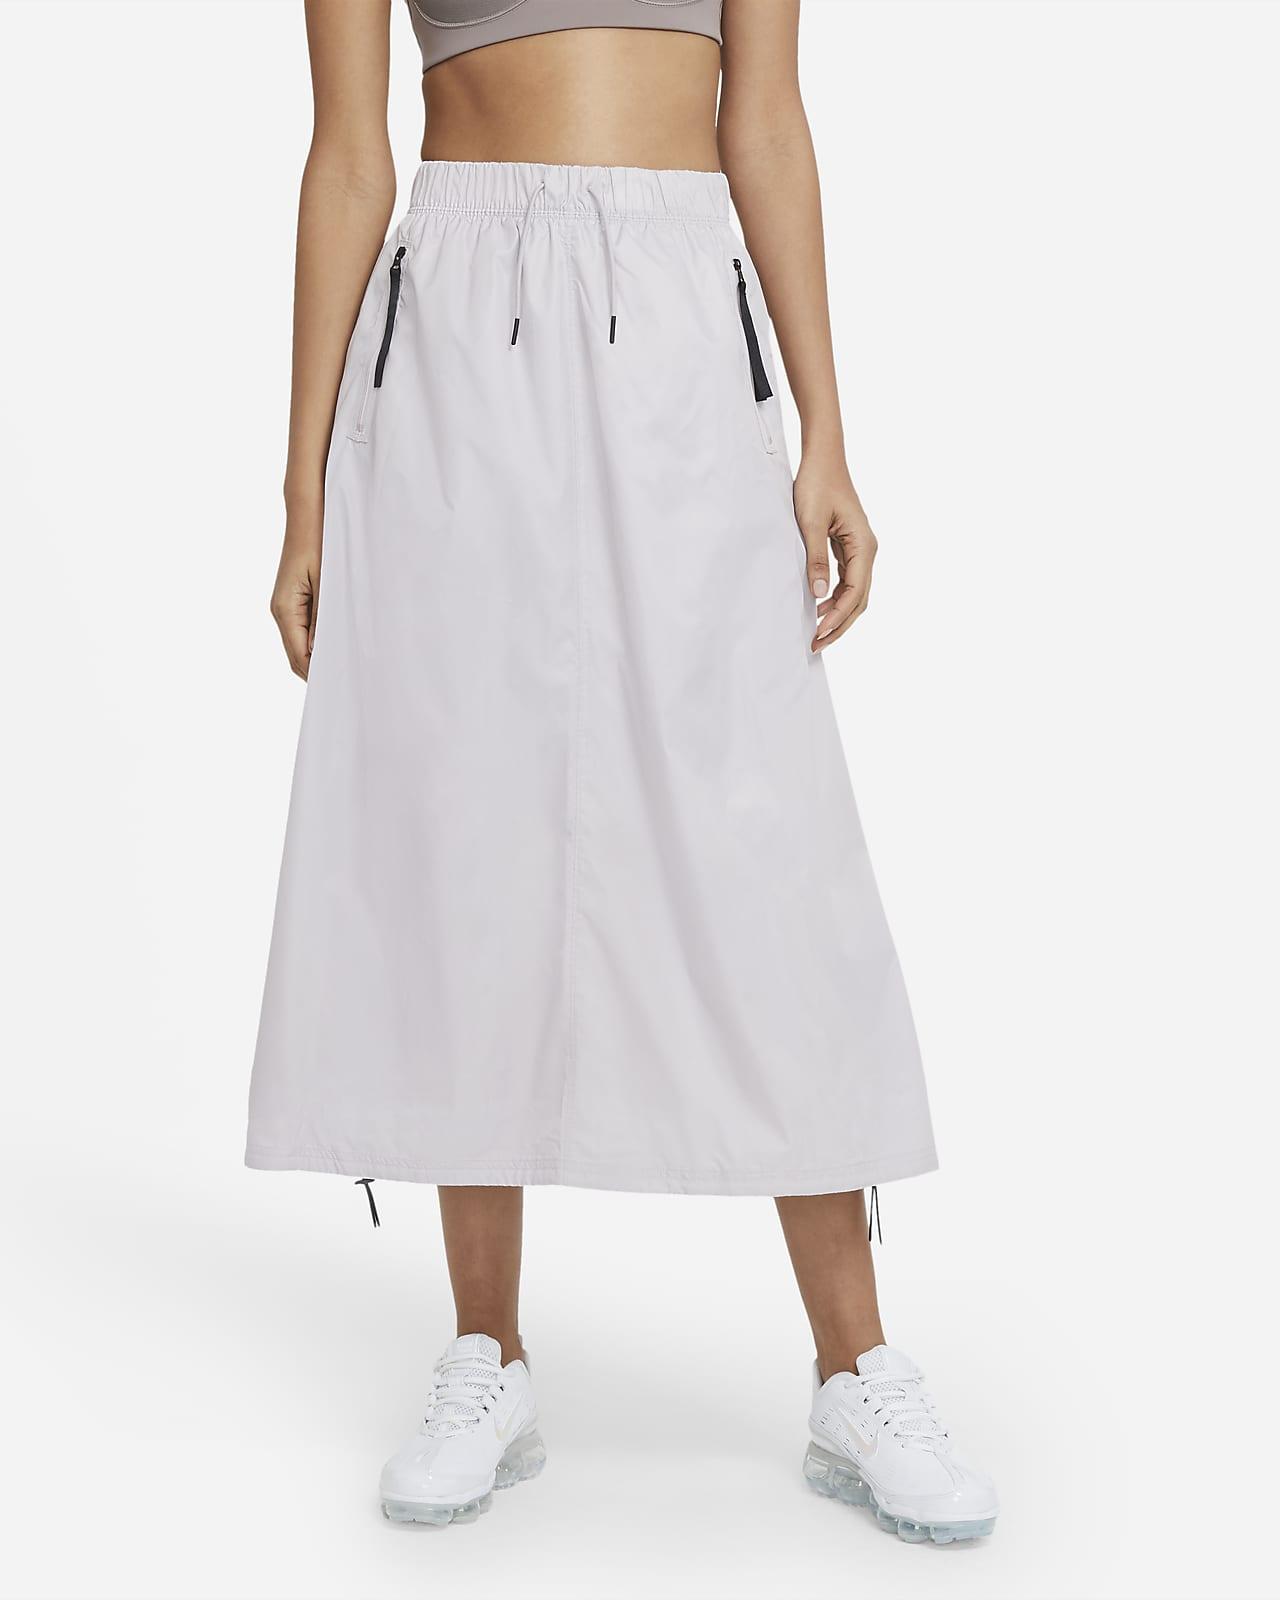 Gonna in tessuto Nike Sportswear Tech Pack - Donna